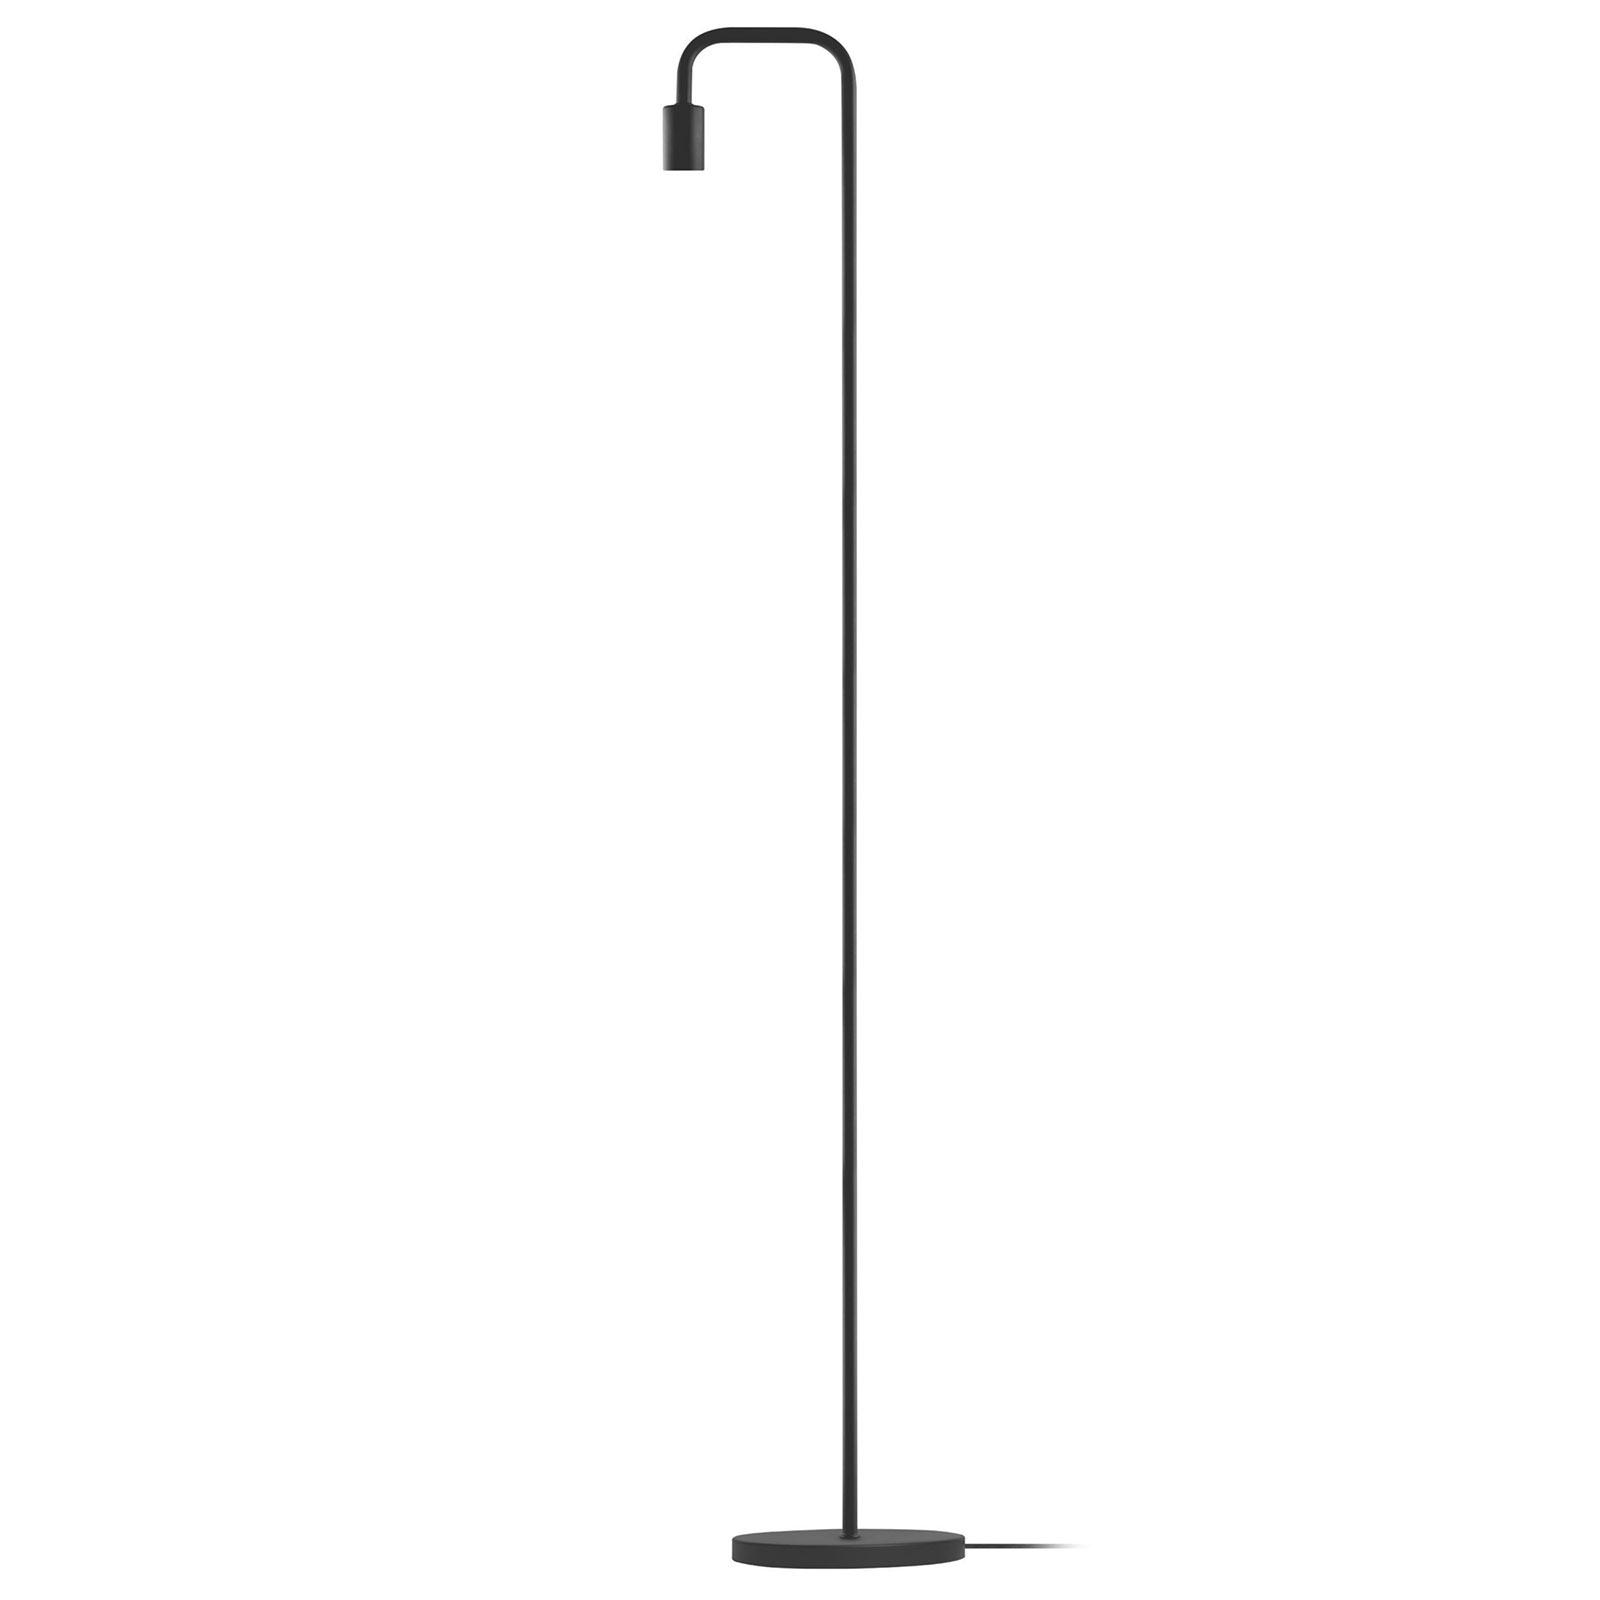 LEDVANCE Vintage Edition 1906 Vloerlamp Pipe Floor